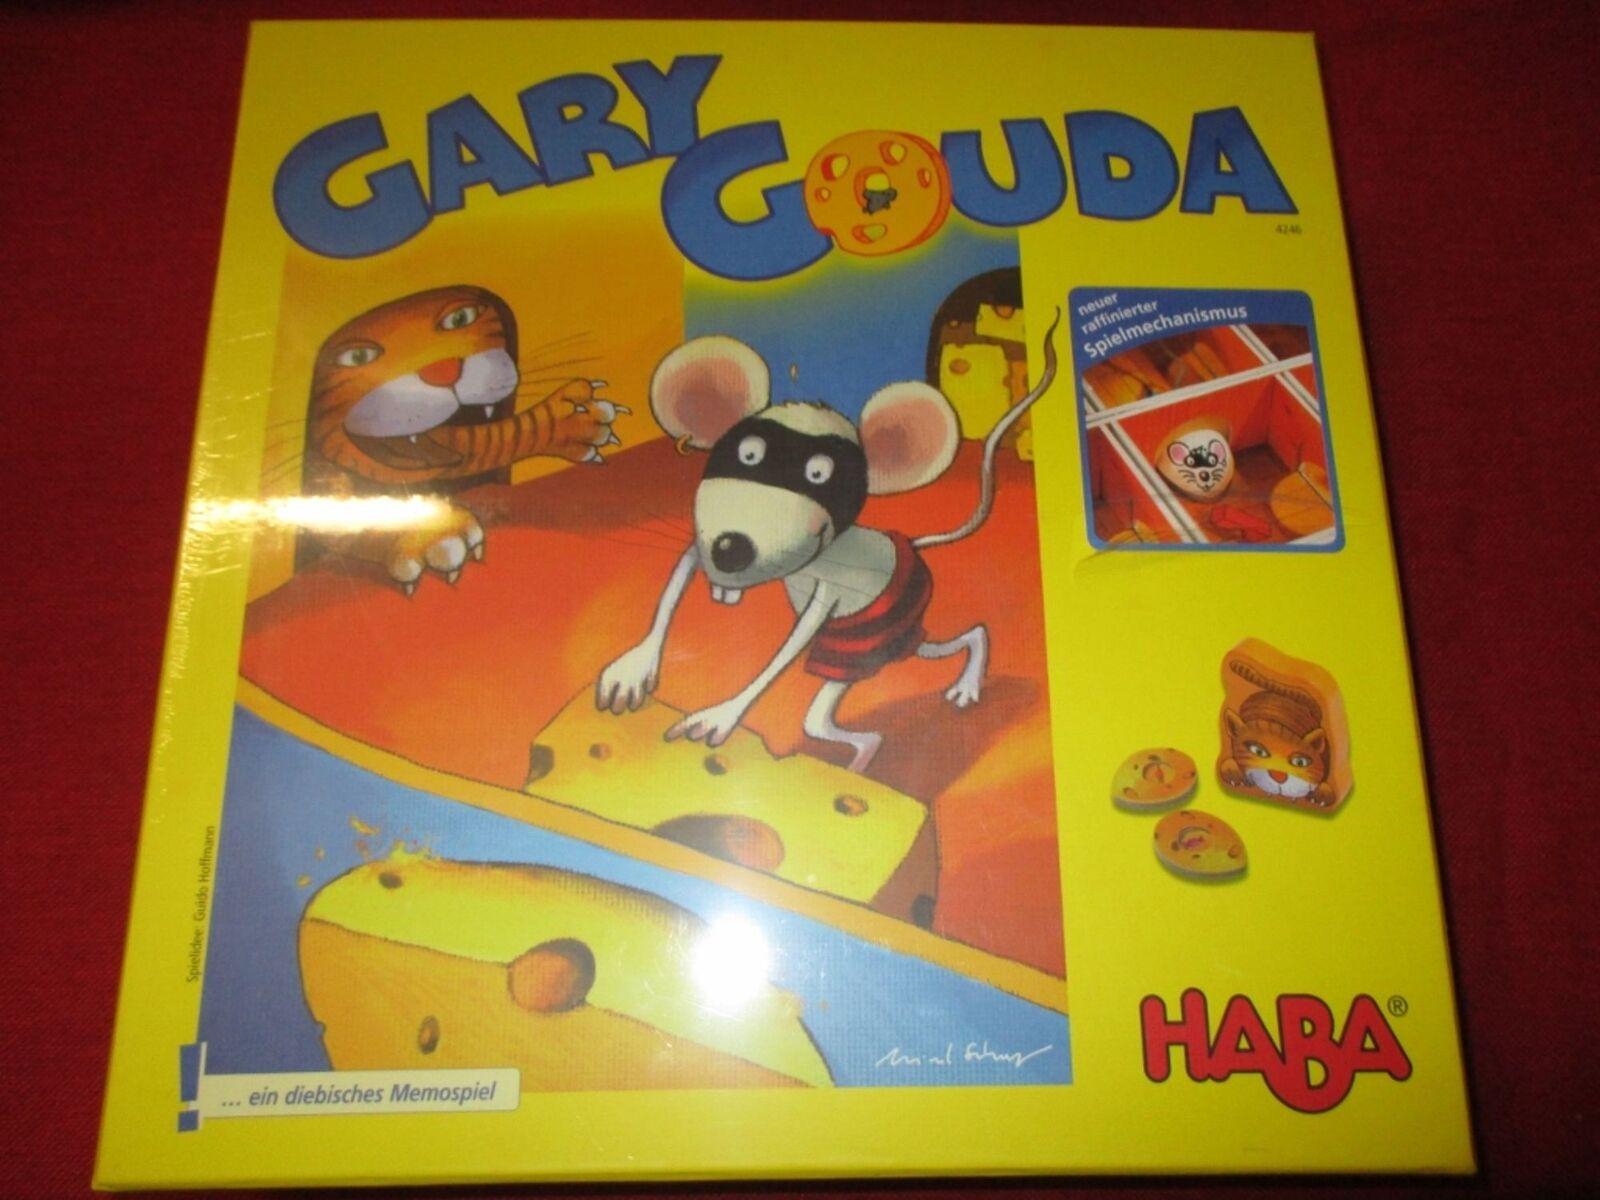 Haba ® 4246 jeu de plateau Gary Gouda Nouveau neuf dans sa boîte